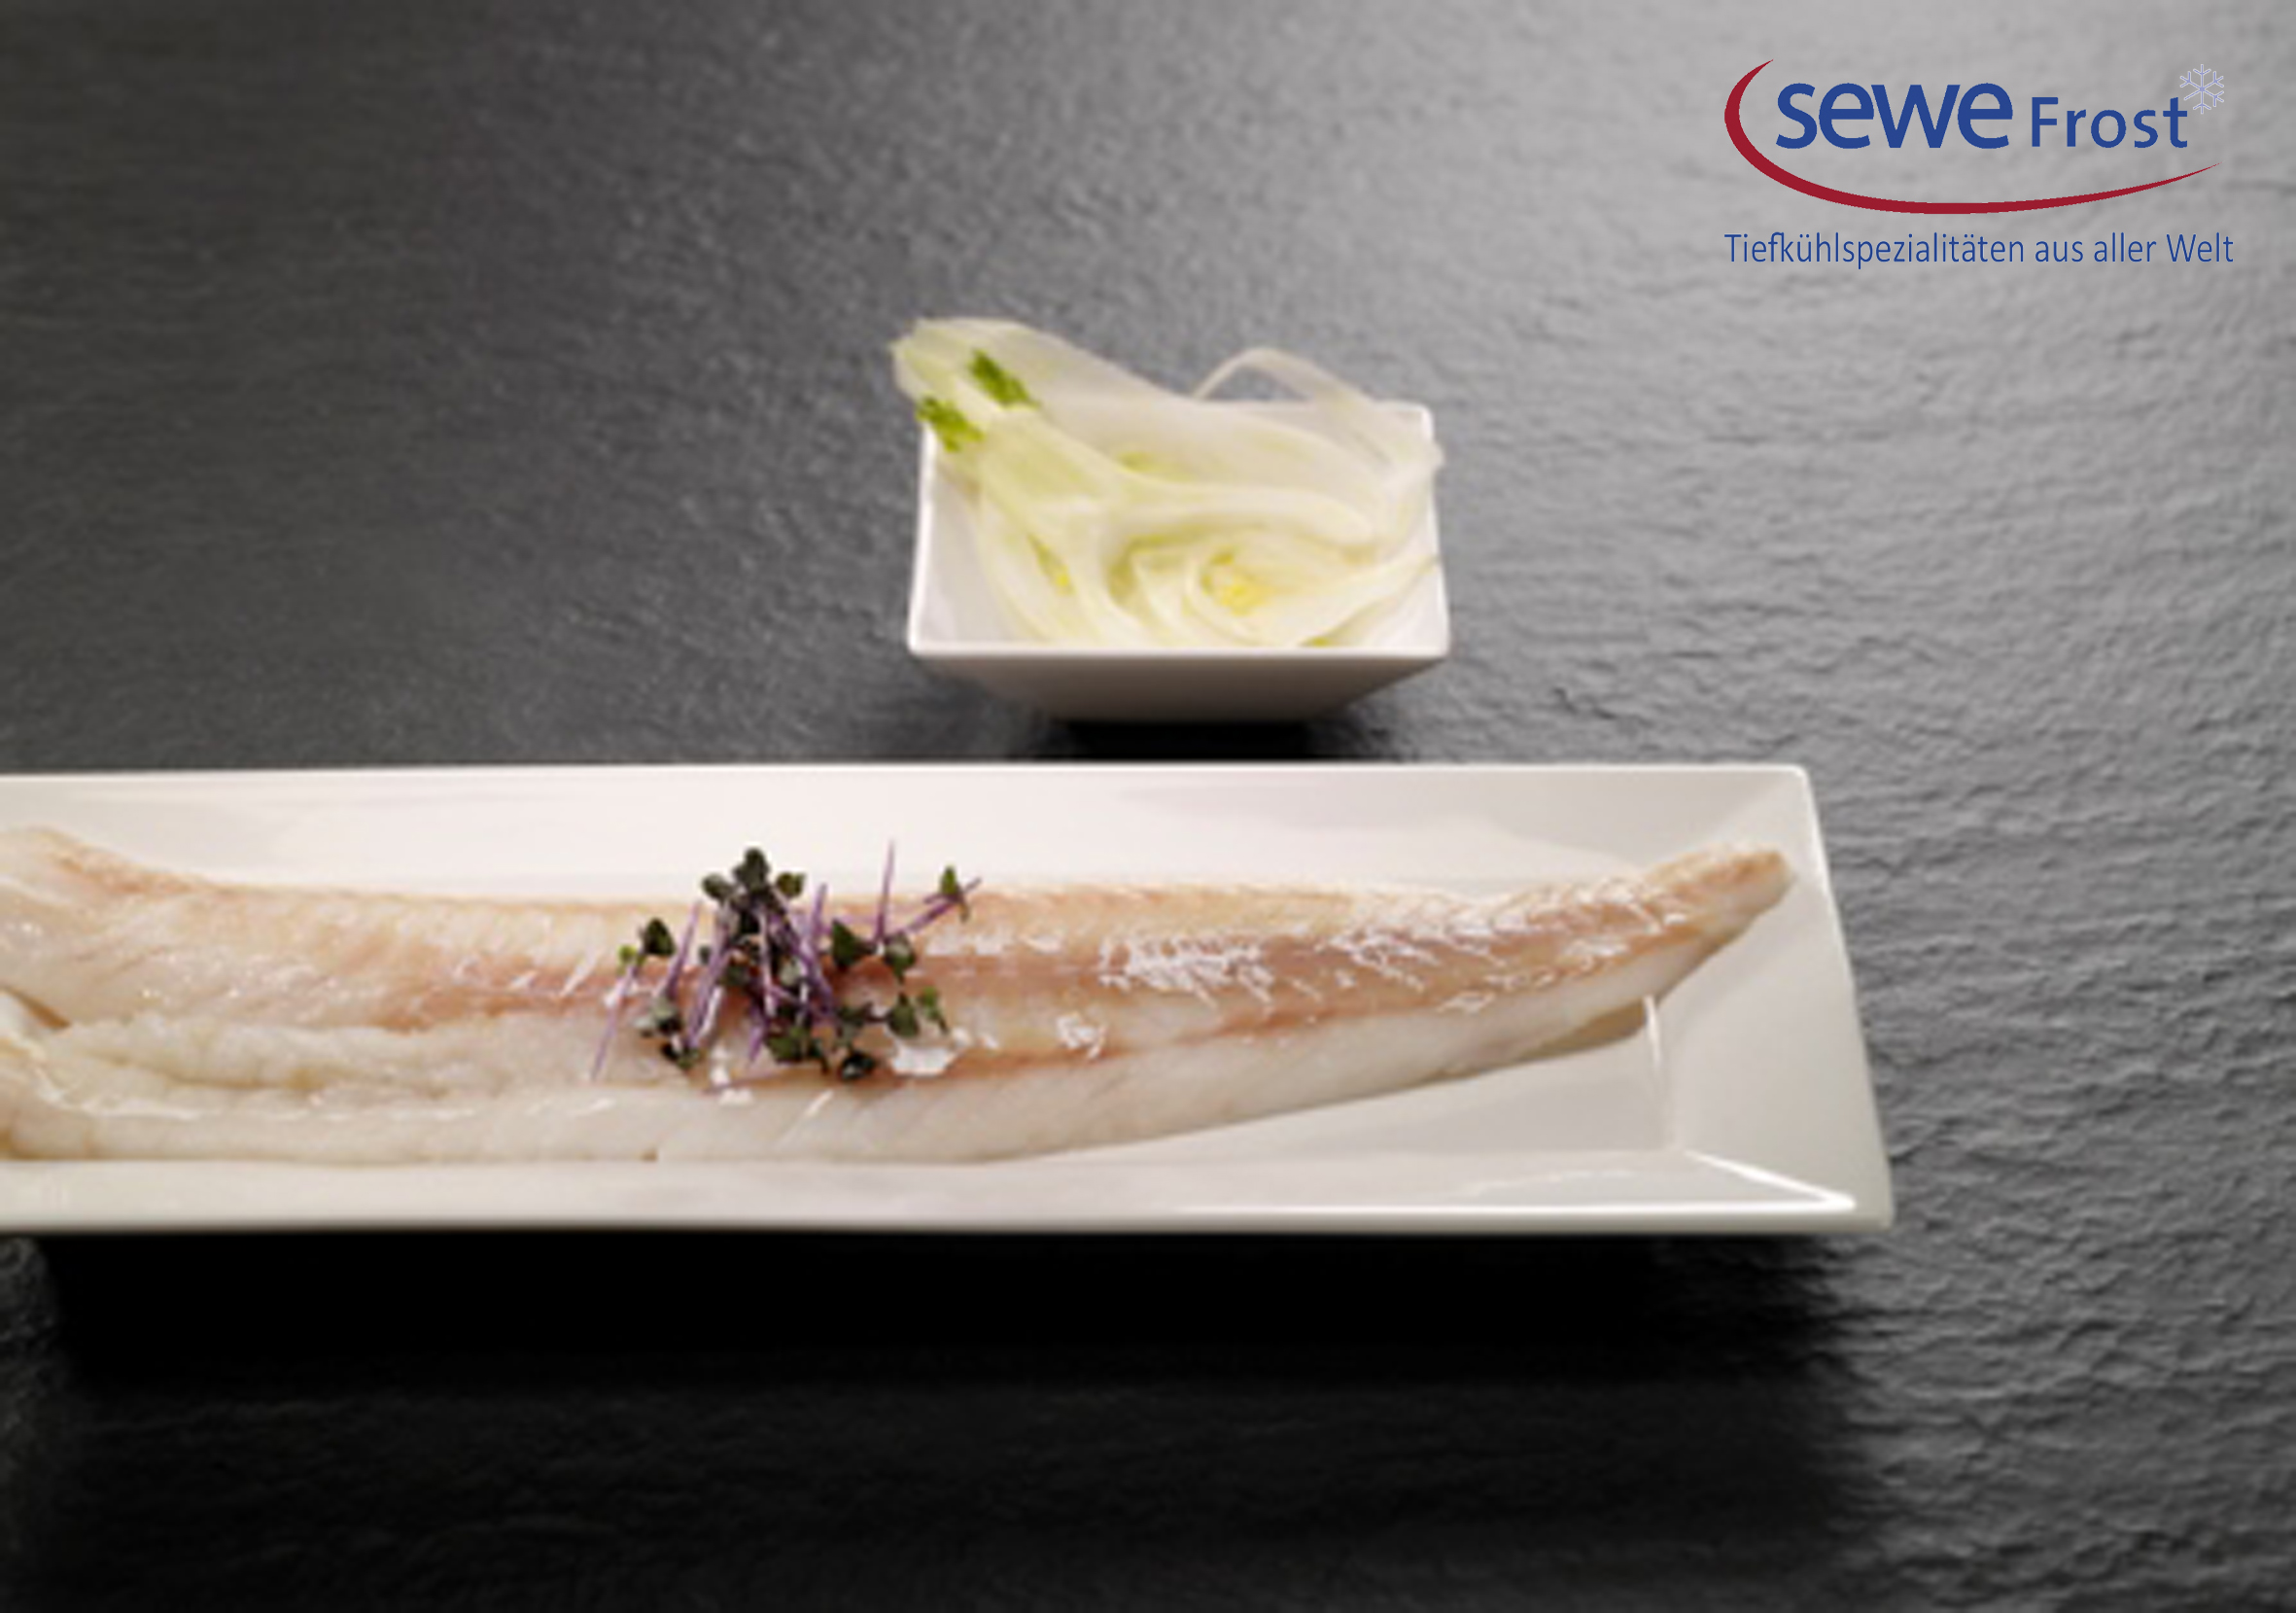 SEWE-Frost Alaska-Seelachsfilets  180-200 g